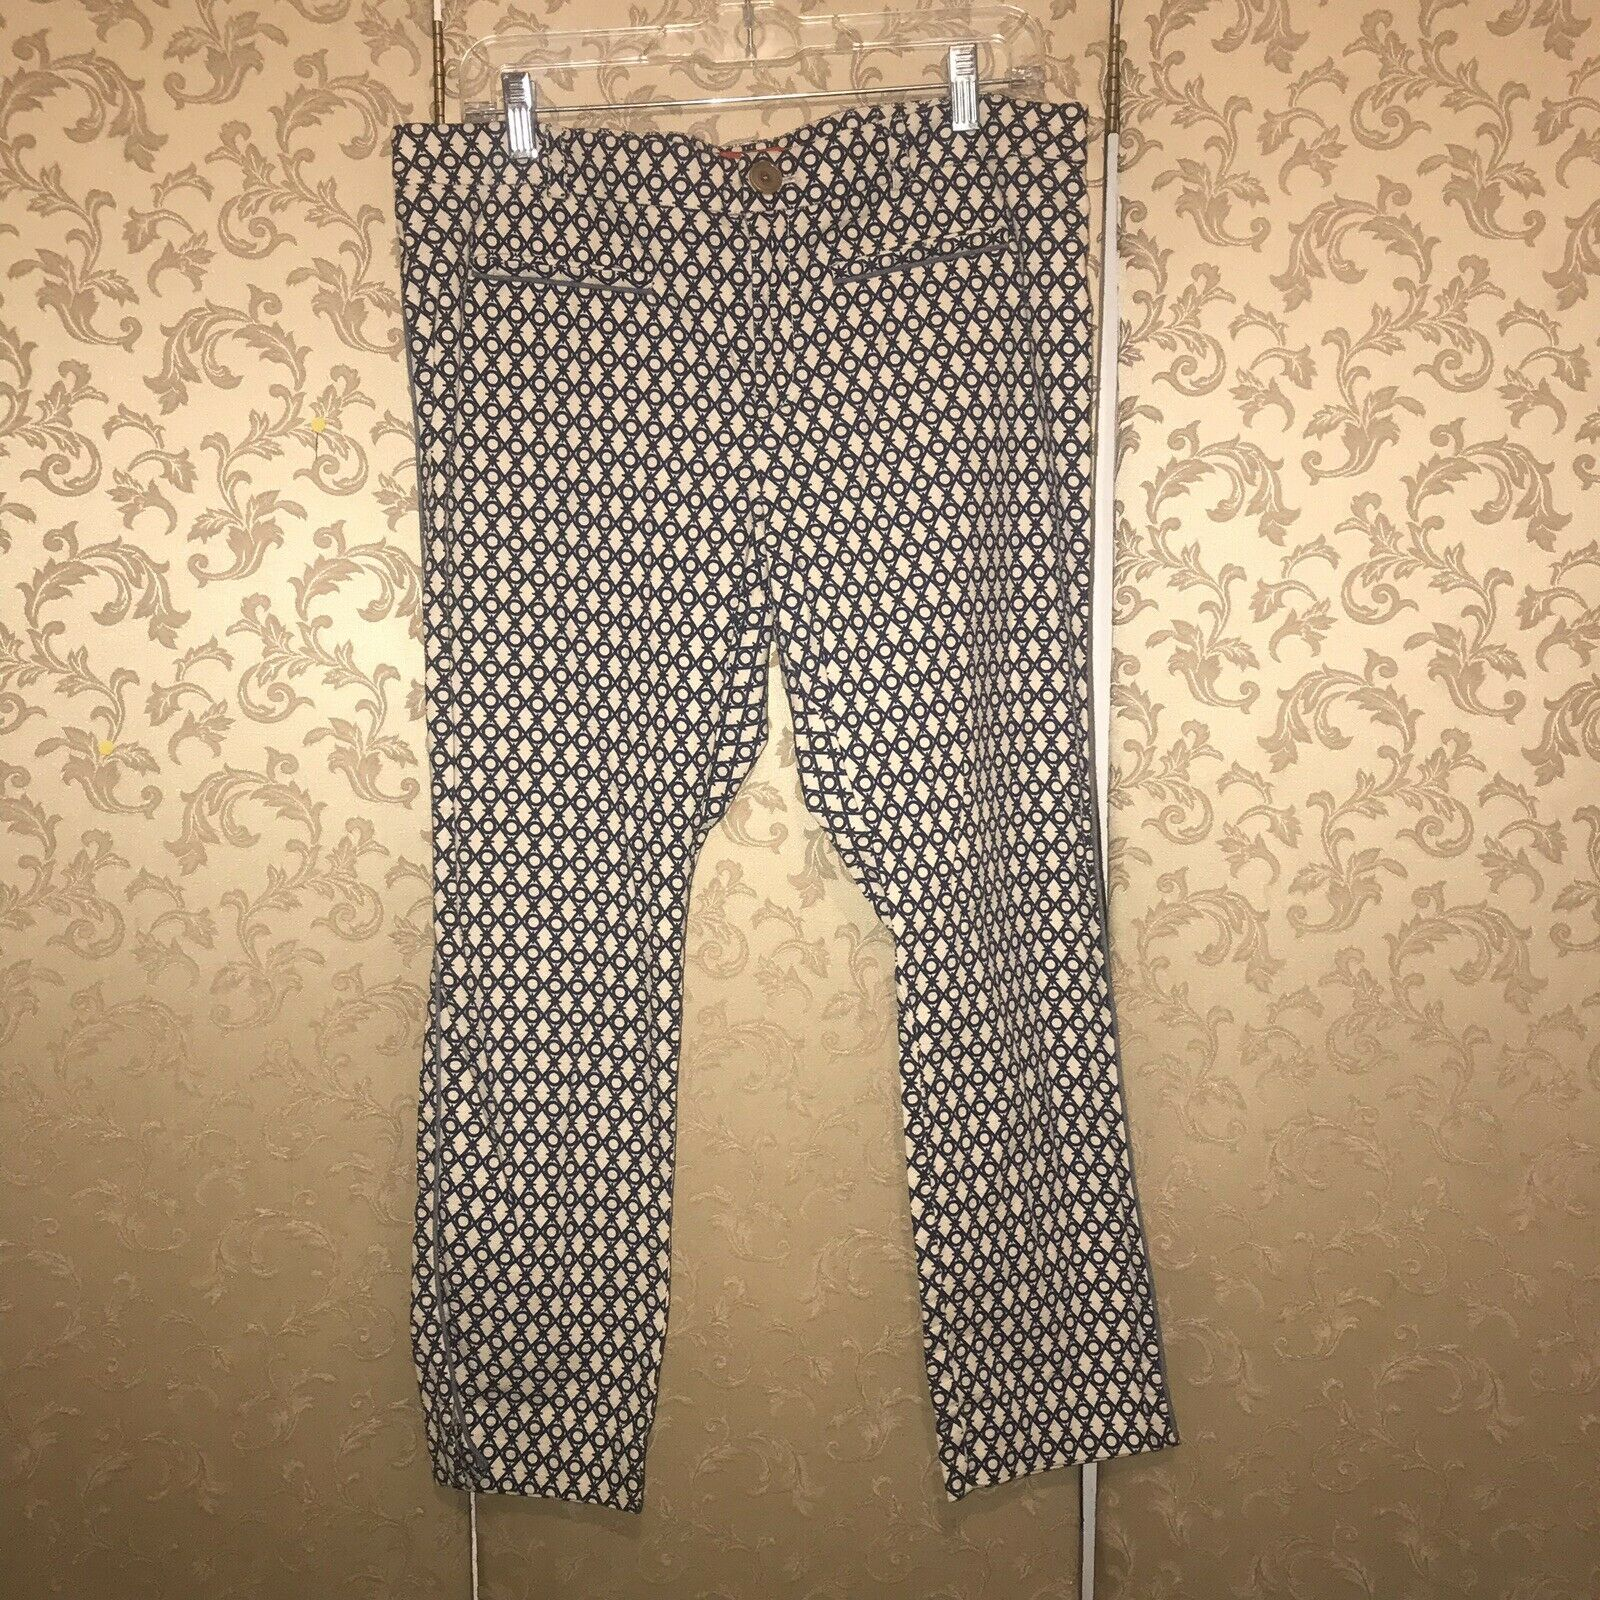 Anthropologie Cartonnier bluee Beige Multi-color Geometric CHARLIE Trousers 12